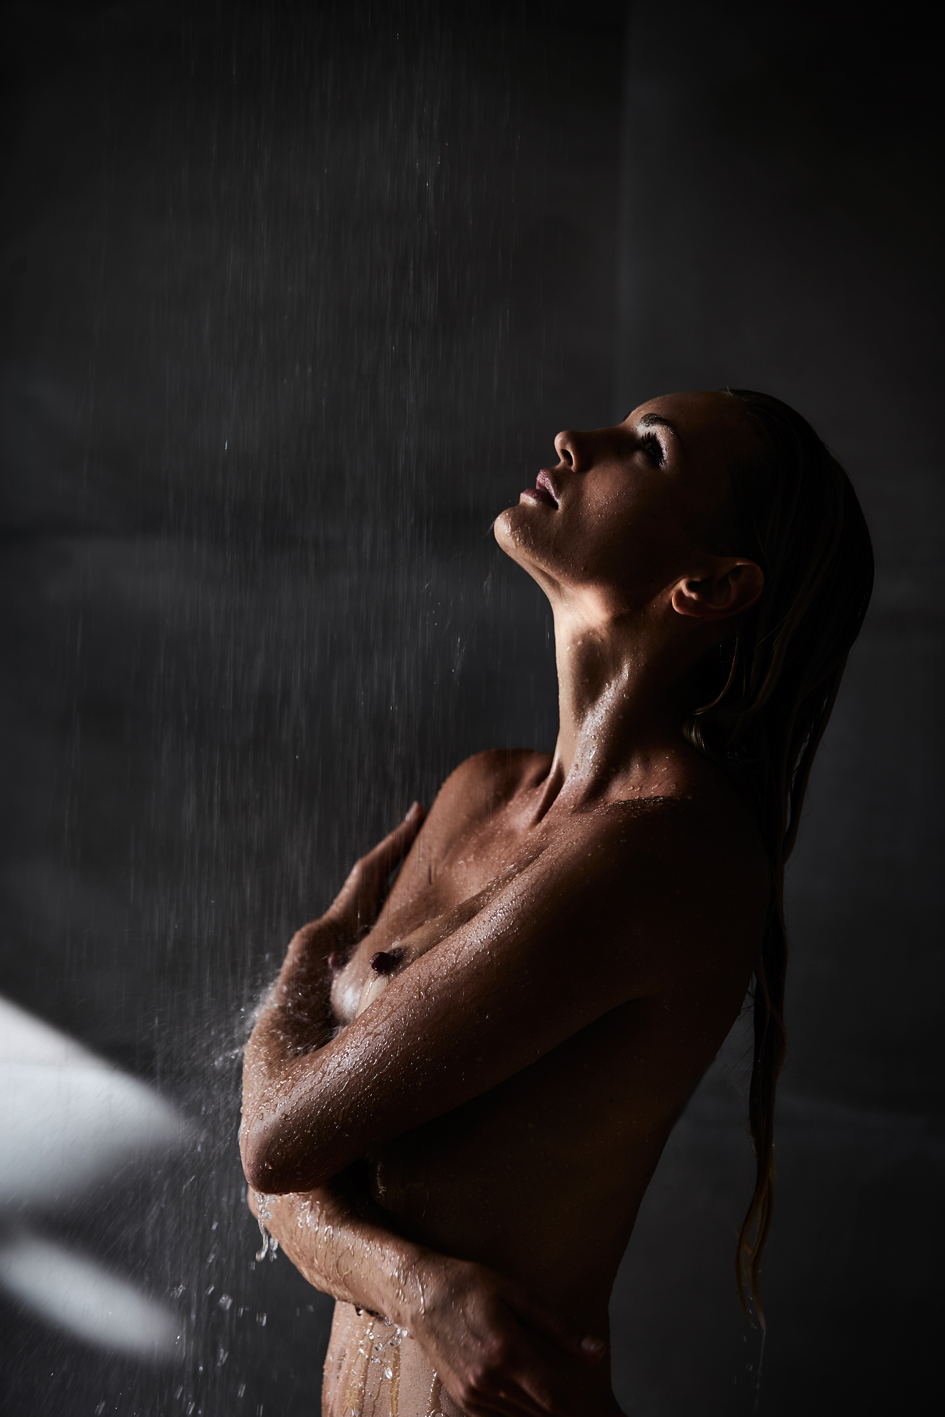 Take_A_Bath_by_TORSTEN_RUPPERT_051.jpg